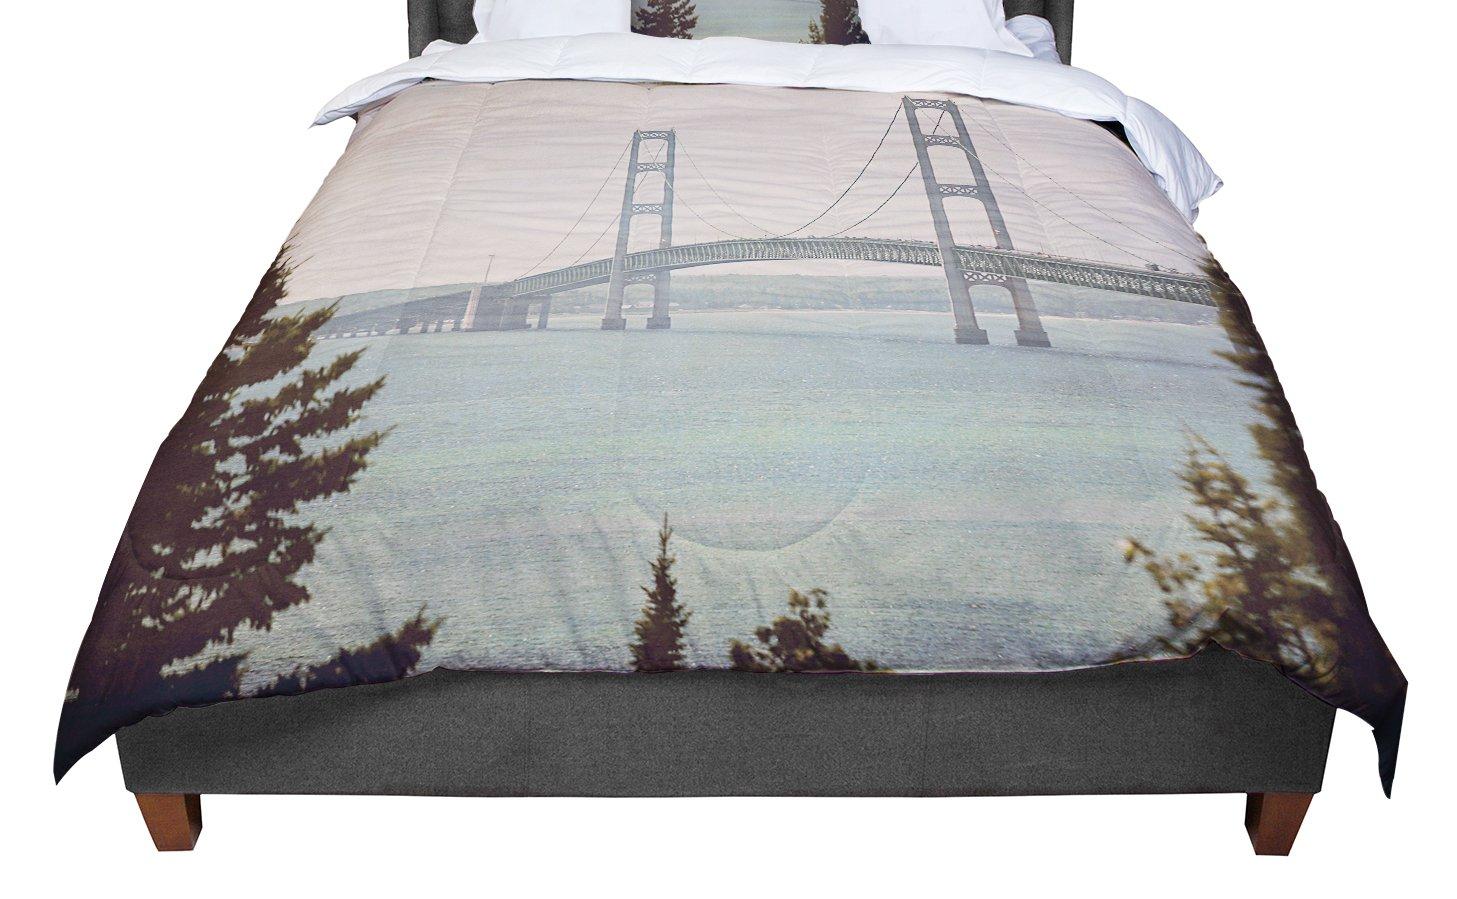 80 x 60 Fleece Blanket Kess InHouse Just L Versus Spray Blk Gld Abstract Illustration Throw